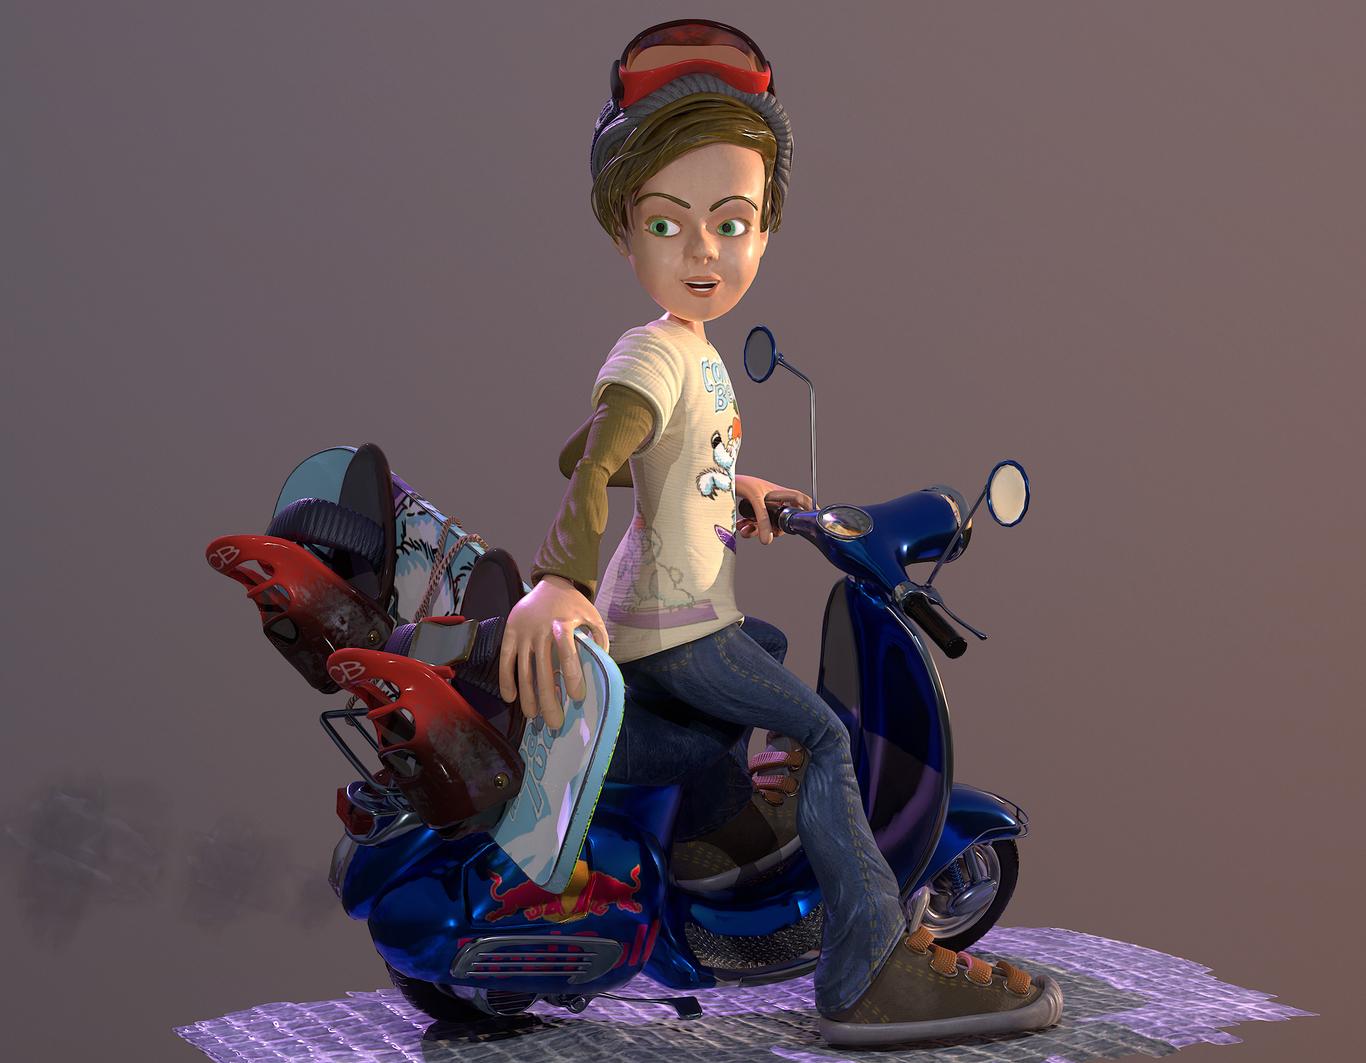 Rabaman71 boy on scooter 1 82ab340d 9nj3